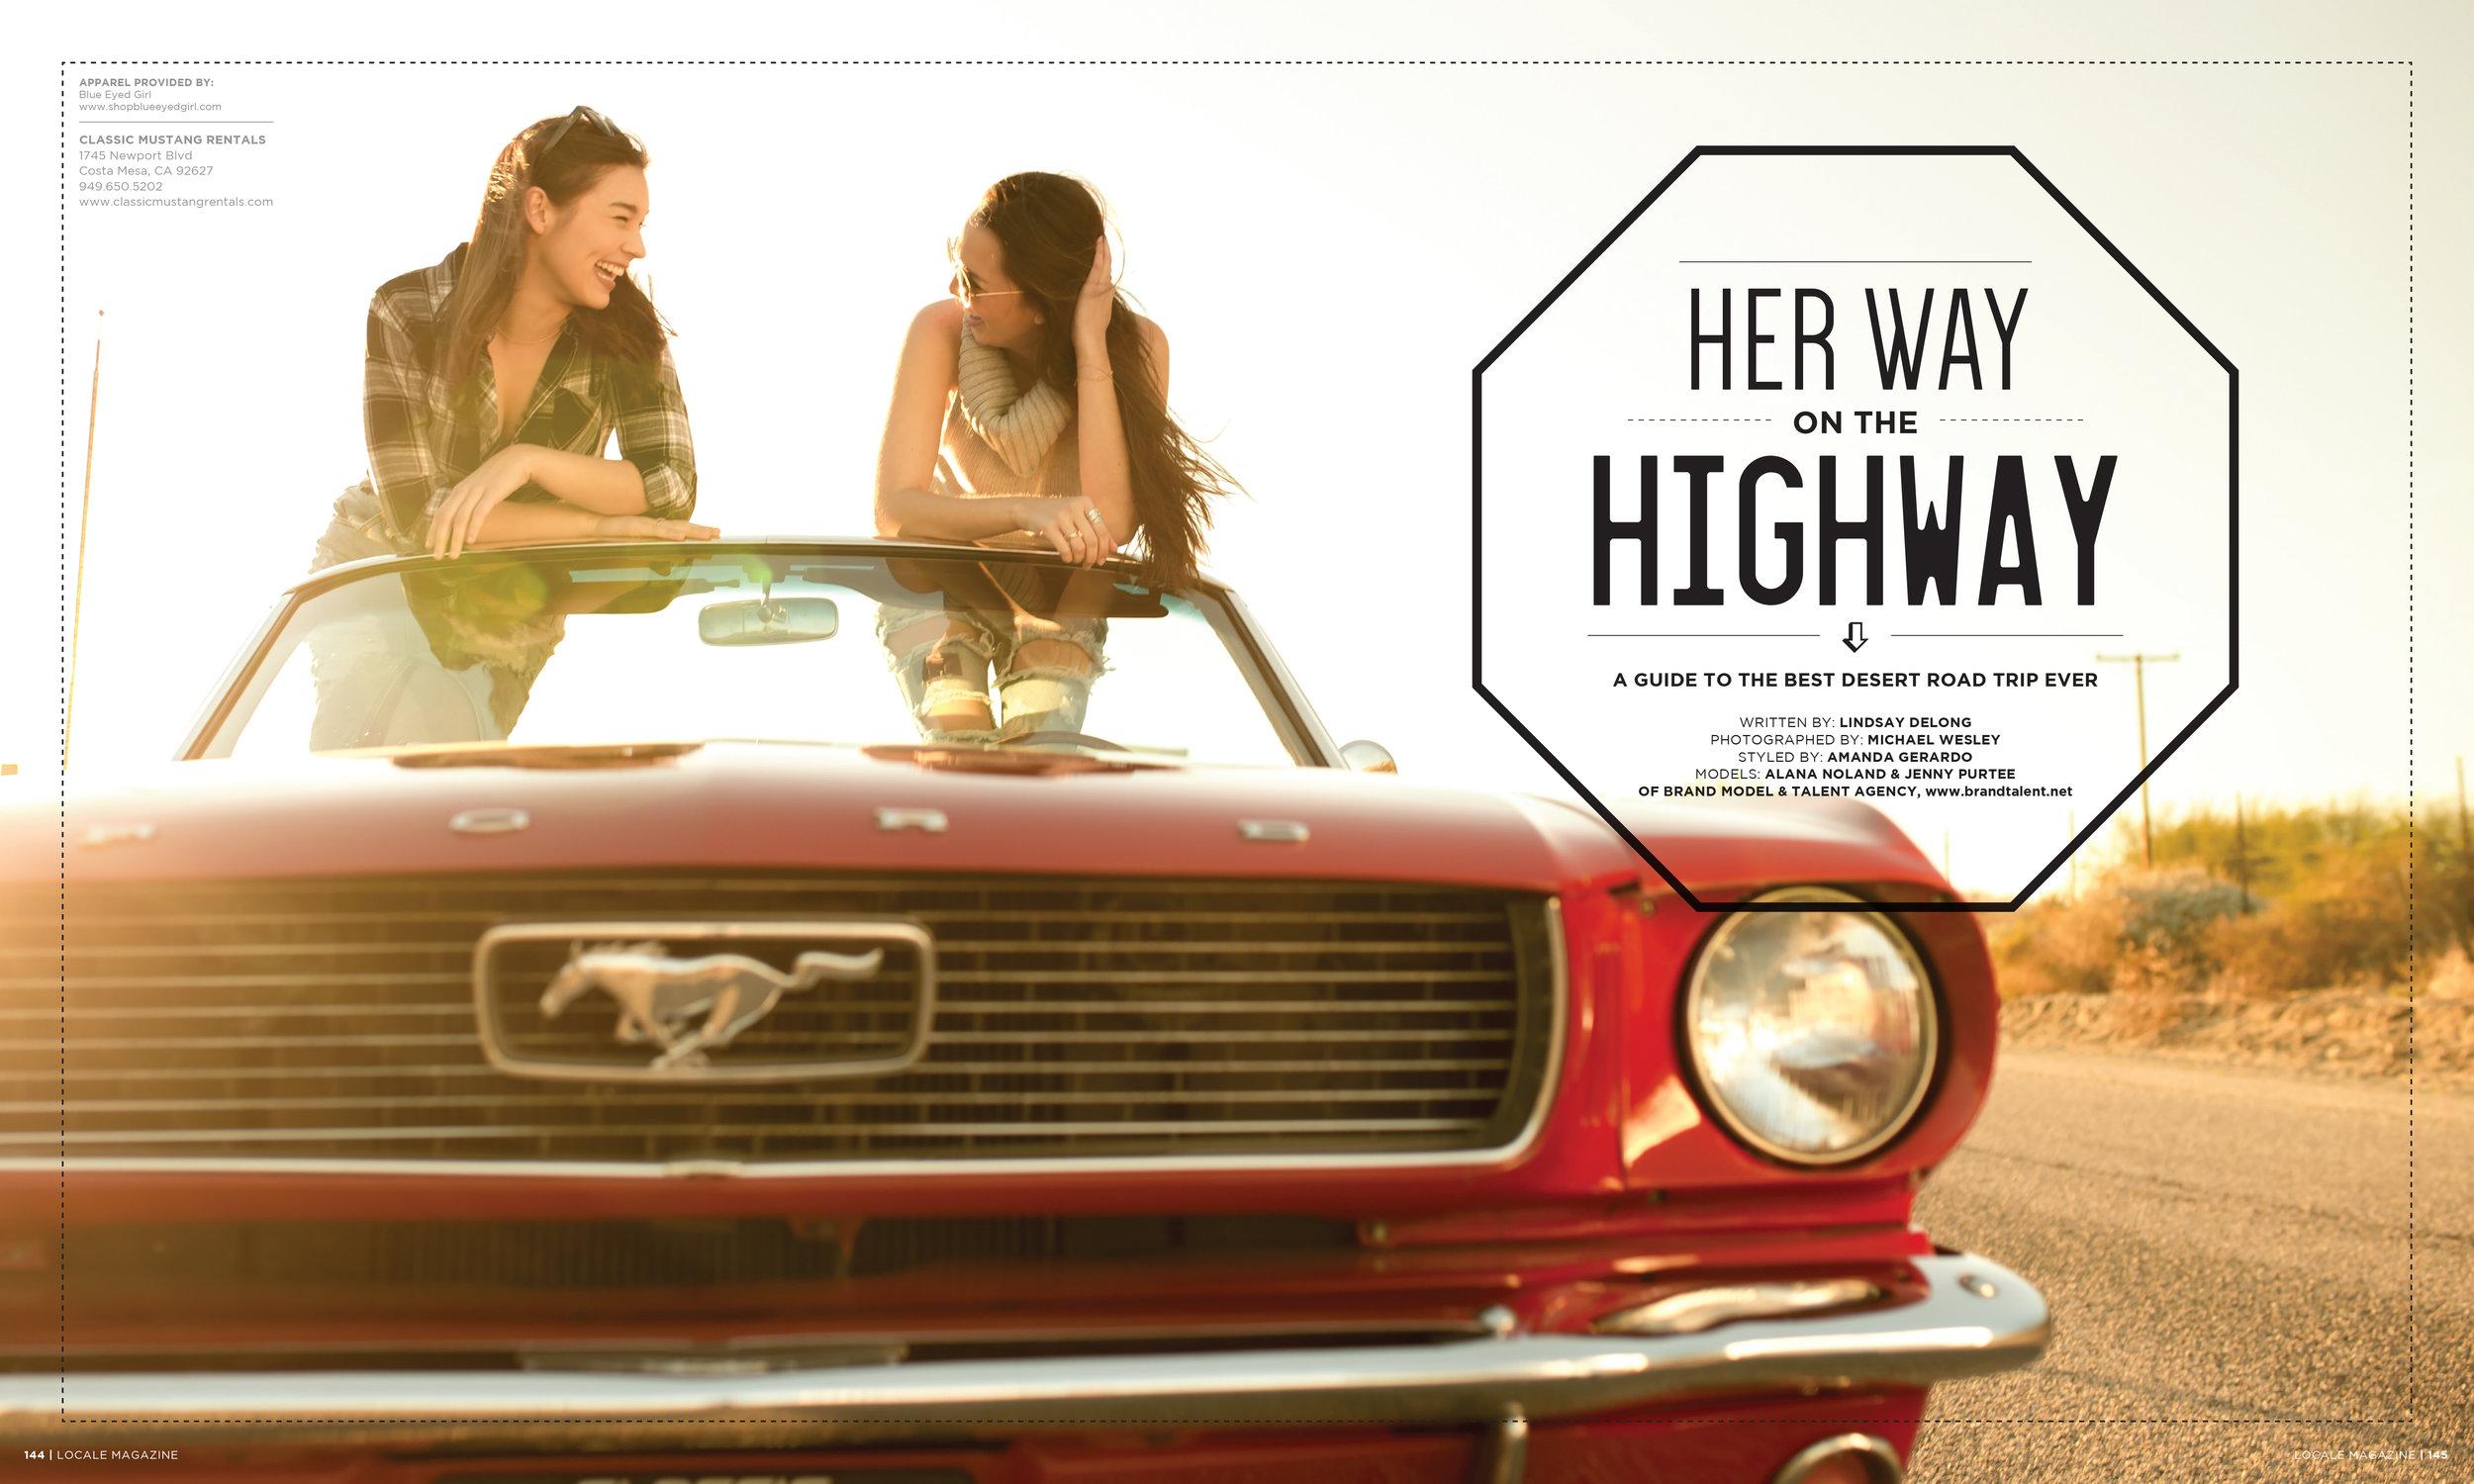 Her Way on the Highway.jpg